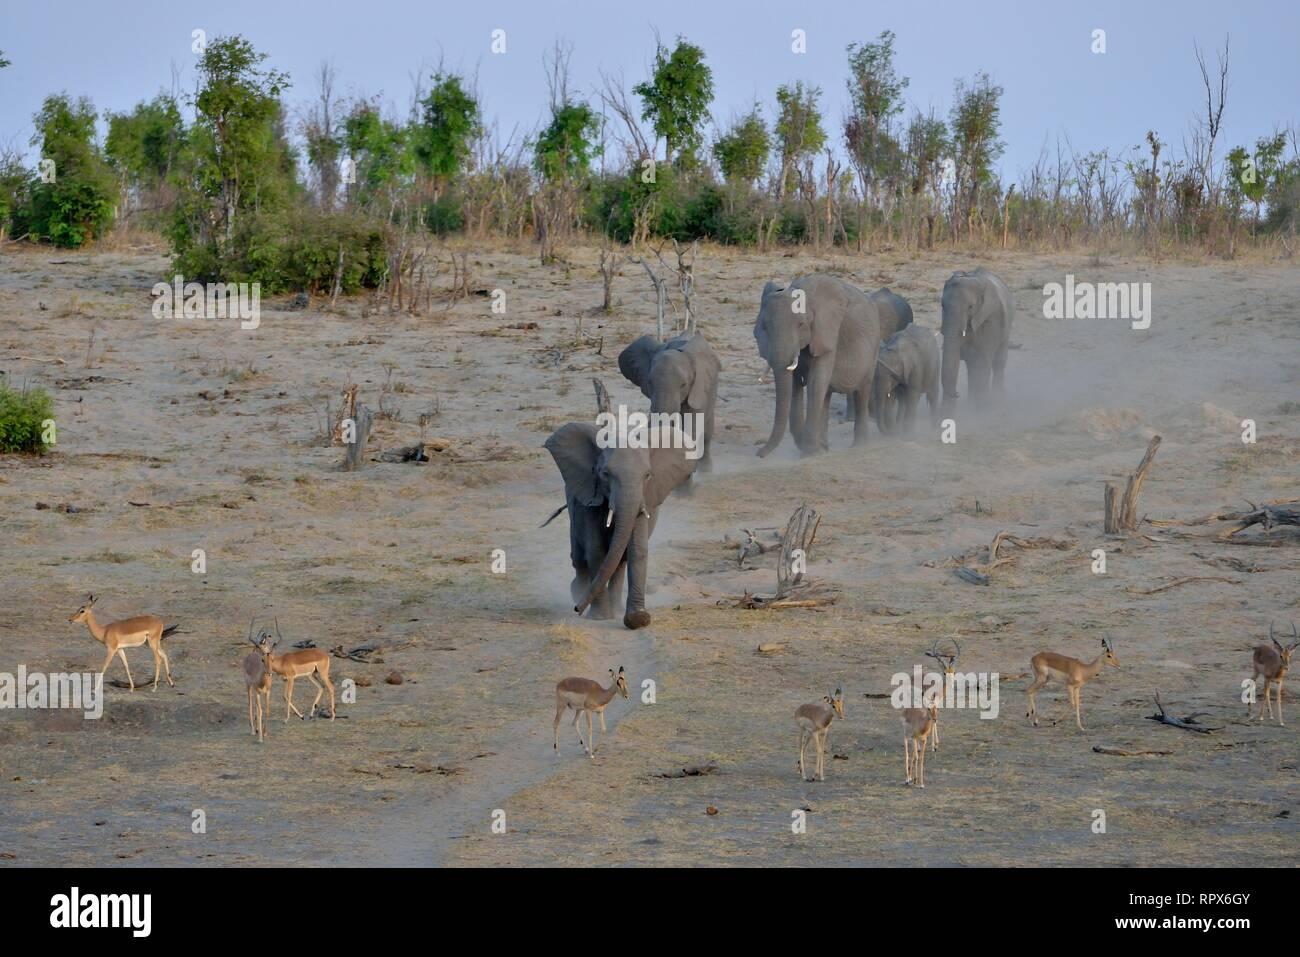 Zoologia, mammifero (mammalia), elefante africano (Loxodonta africana) vicino al camp Somalisa, Parco Nazionale di Hwange, Additional-Rights-Clearance-Info-Not-Available Immagini Stock